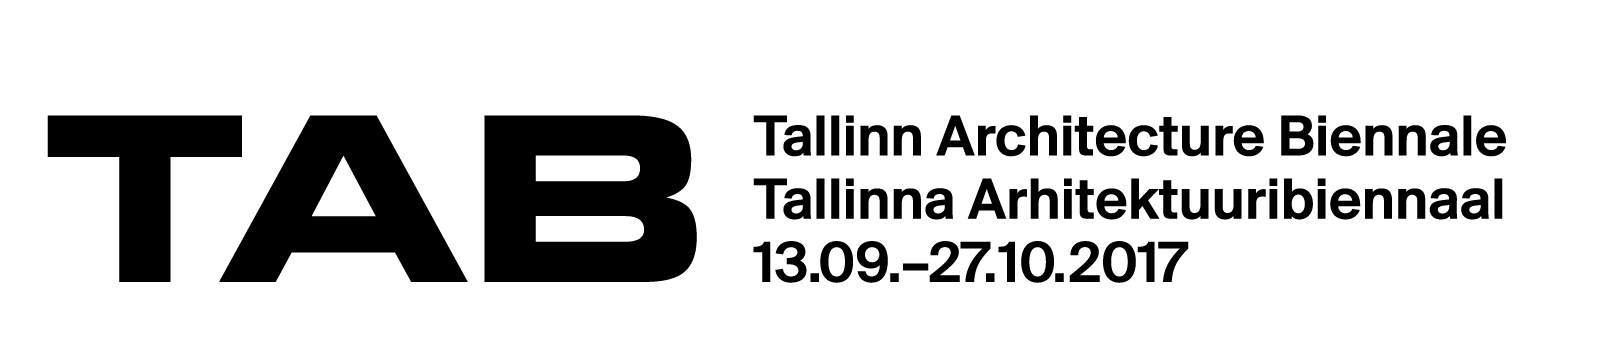 tab-logo-full